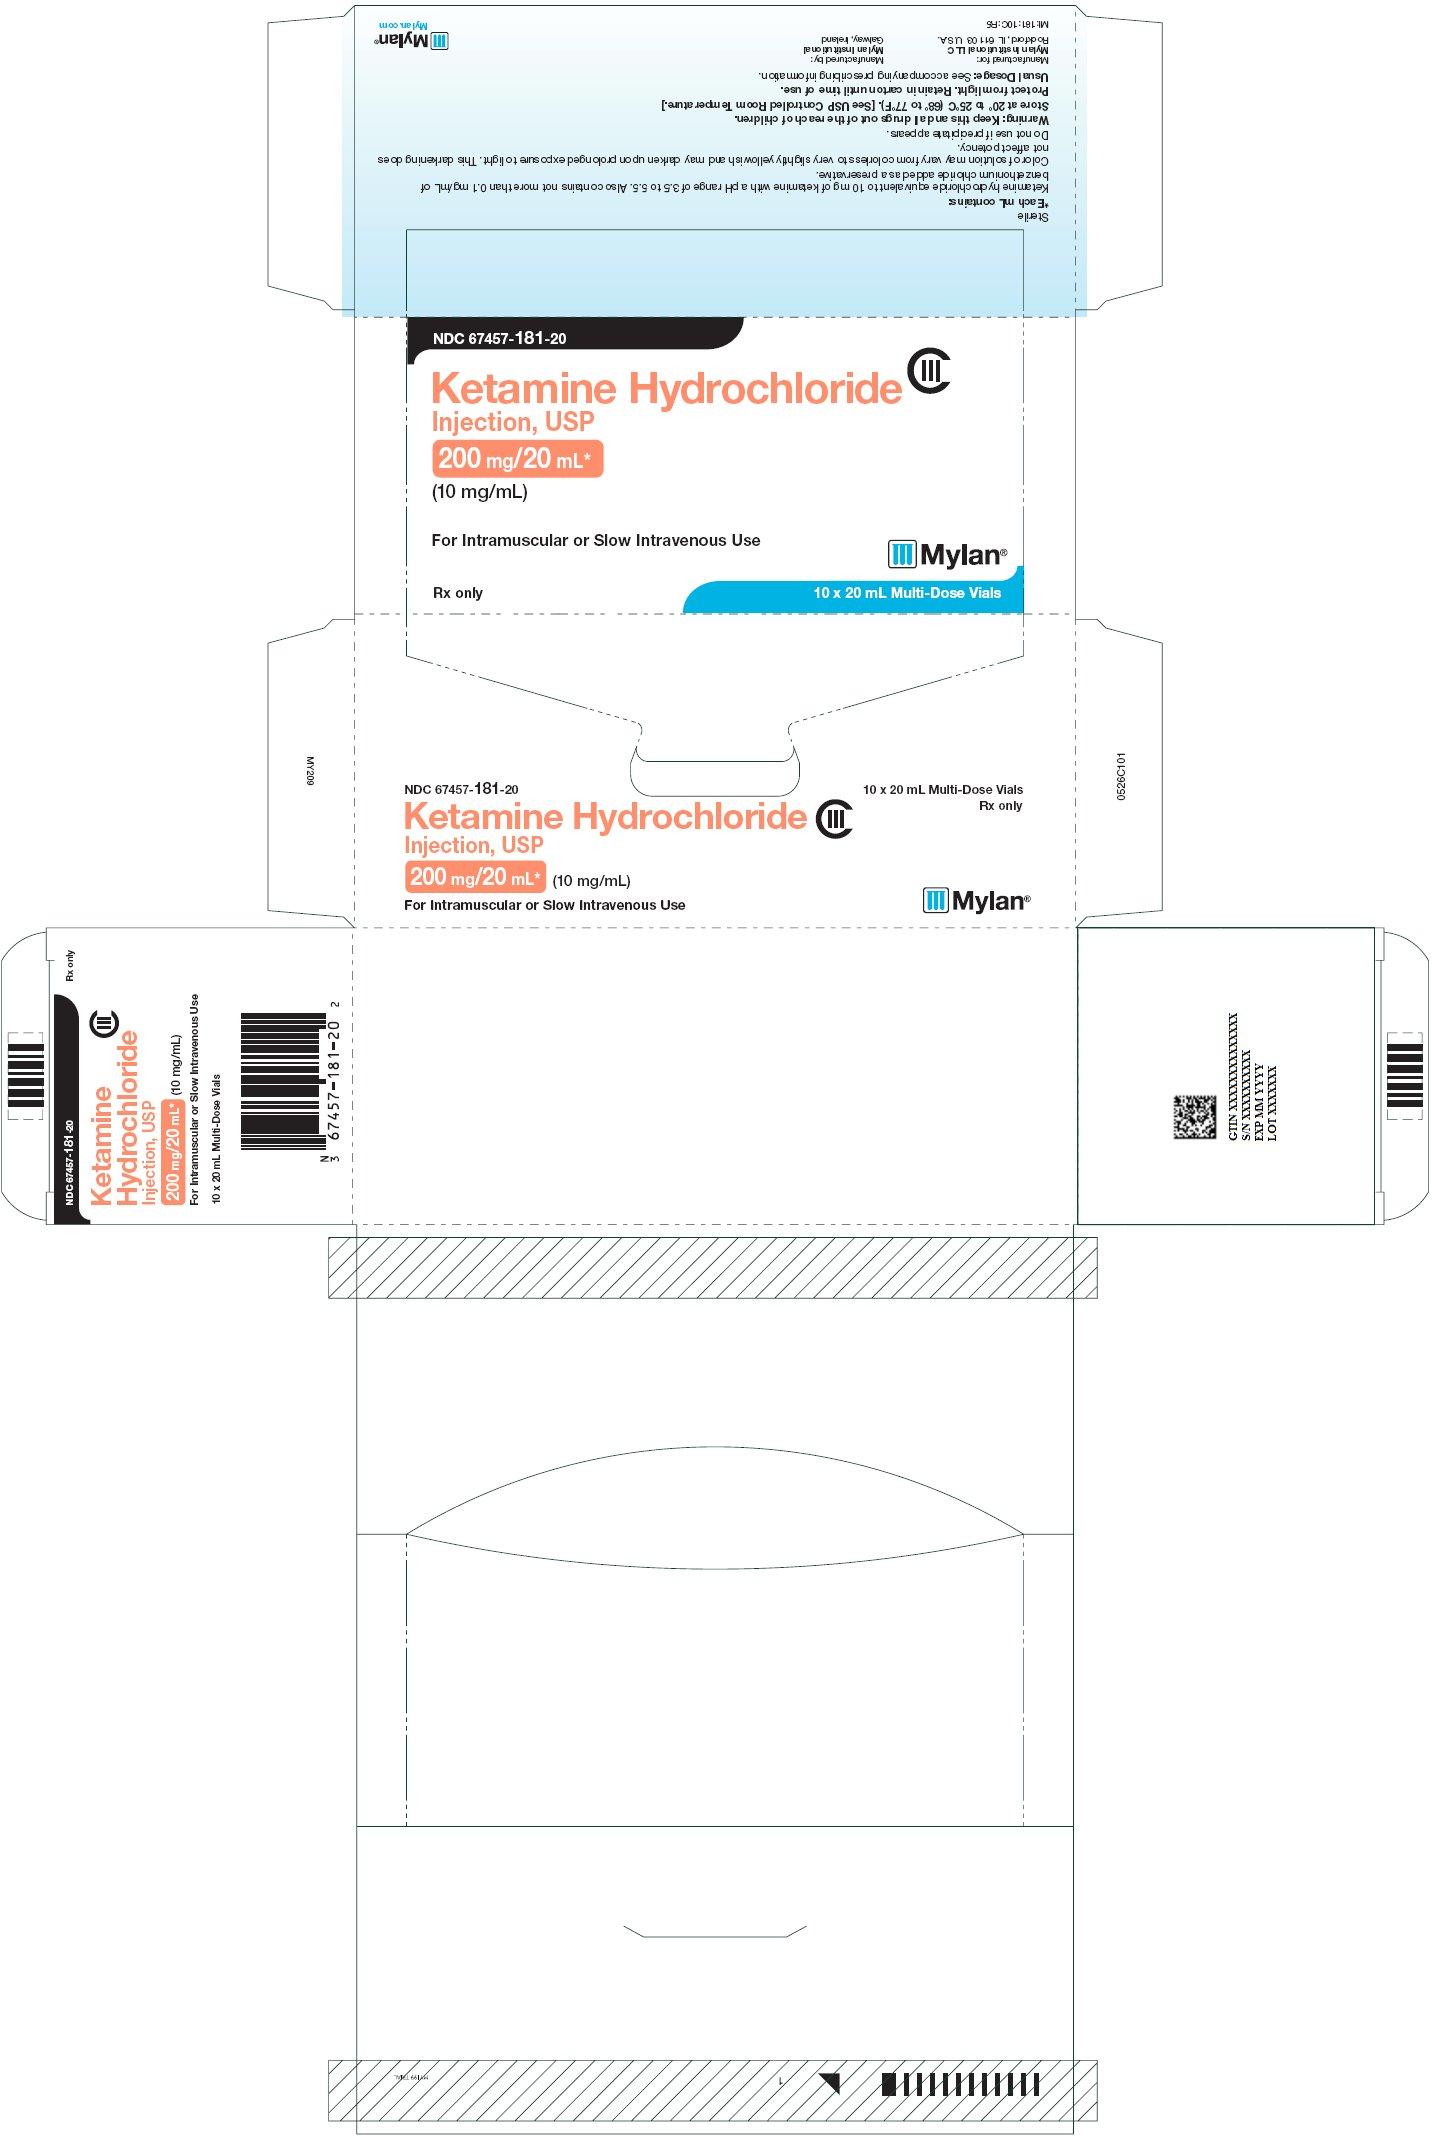 Ketamine Hydrochloride Injection 200 mg/20 mL Carton Label